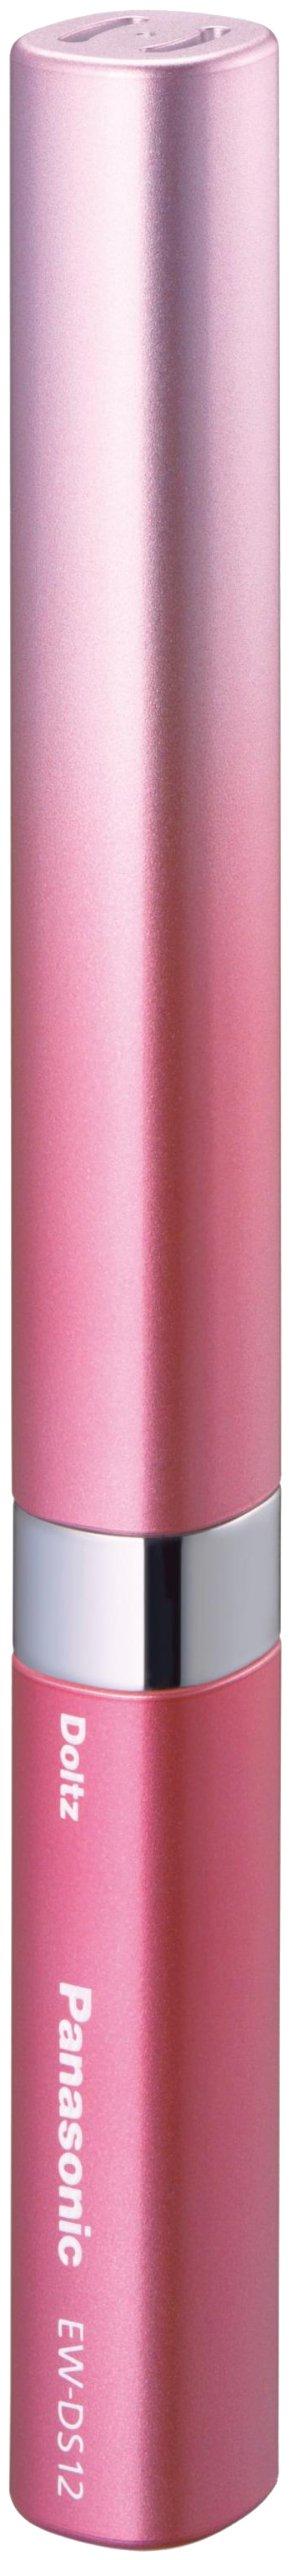 Panasonic Pocket Doltz EW-DS12 Pink | Power Toothbrush 1.06oz (Japan Import)